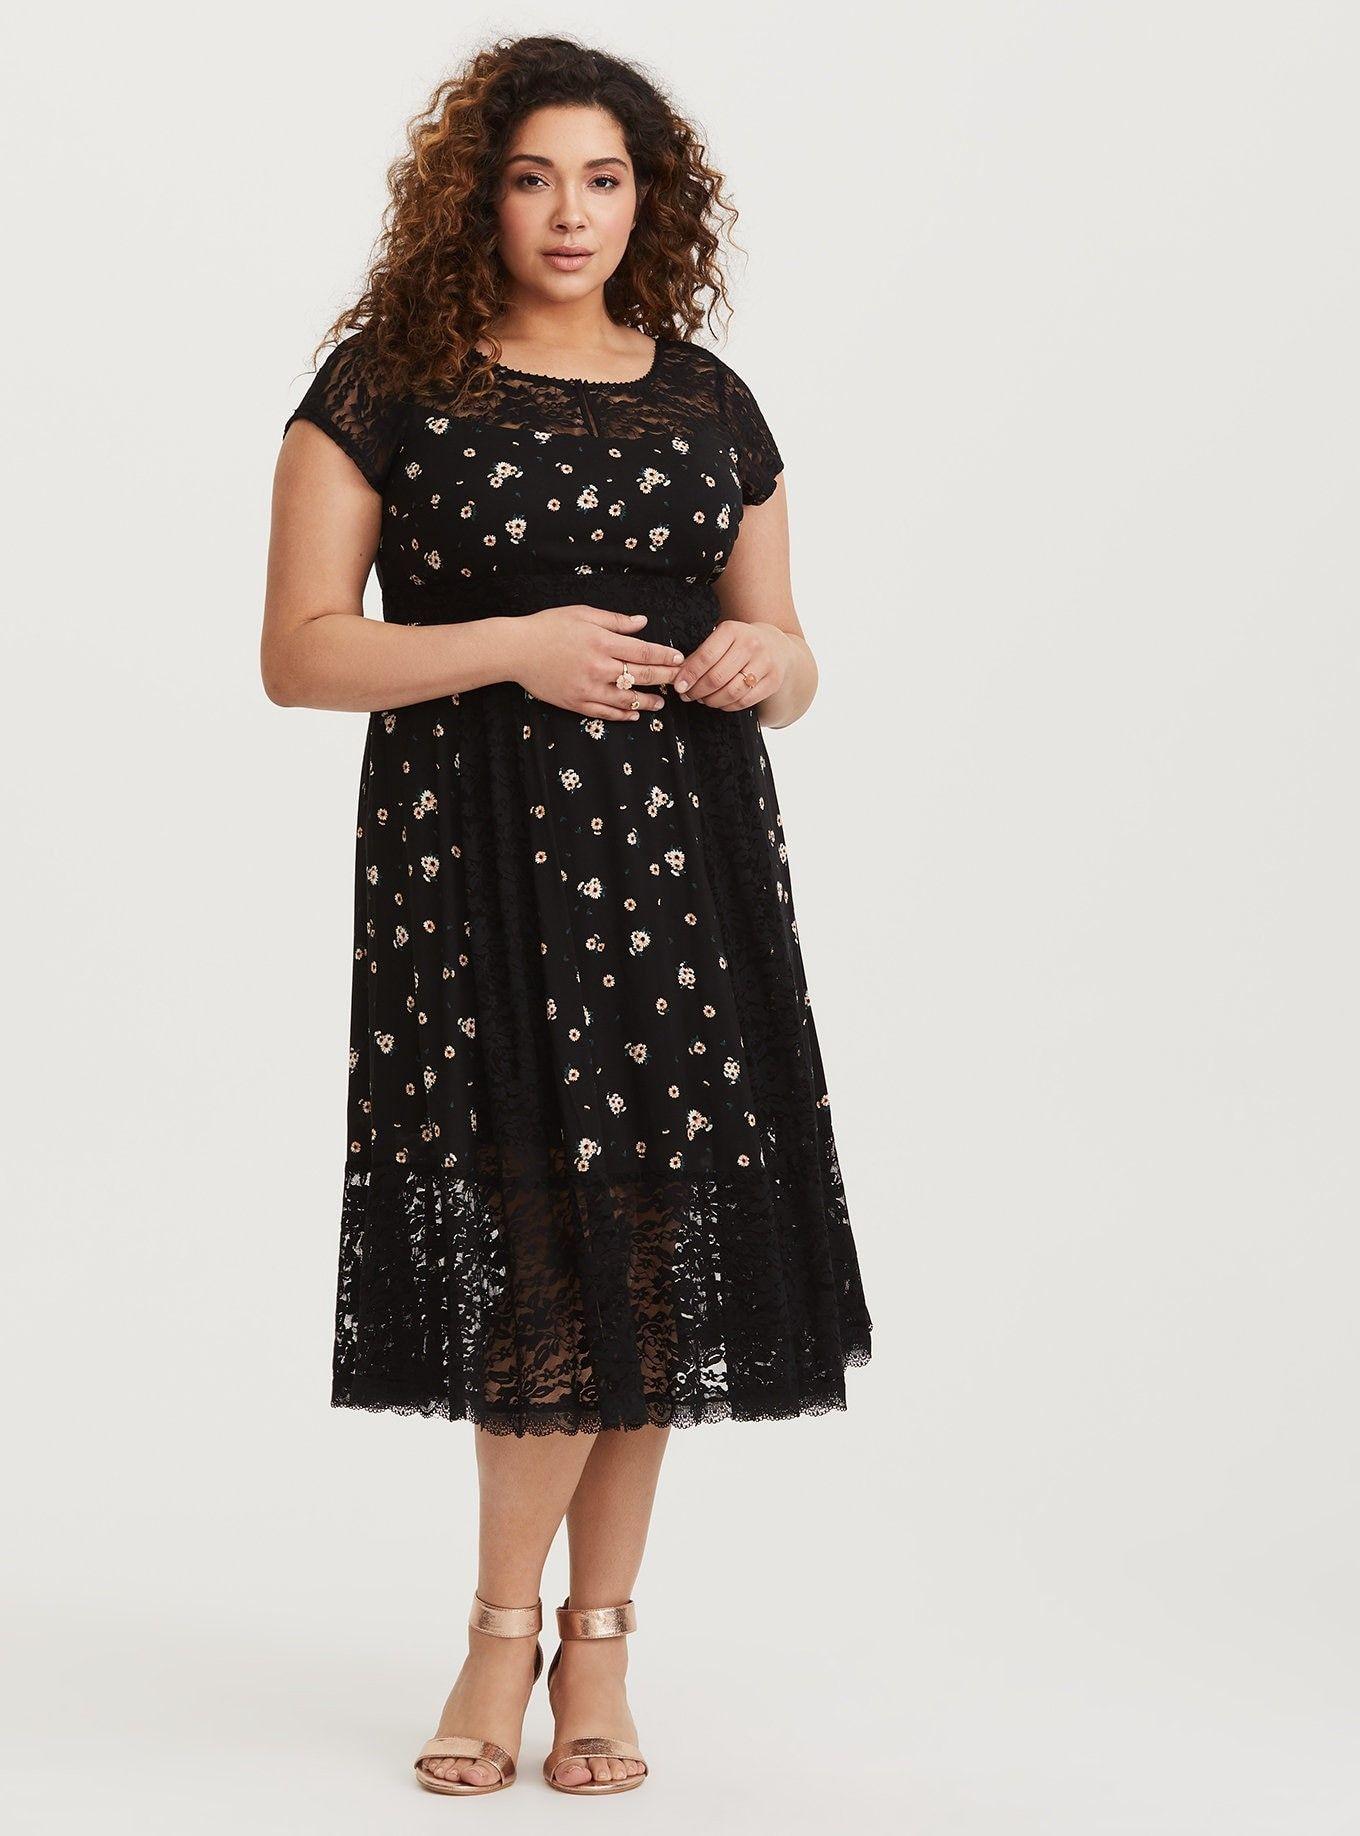 Black Sunflower Challis Midi Dress Dresses Challis Dress Pluse Size Dress [ 1836 x 1360 Pixel ]